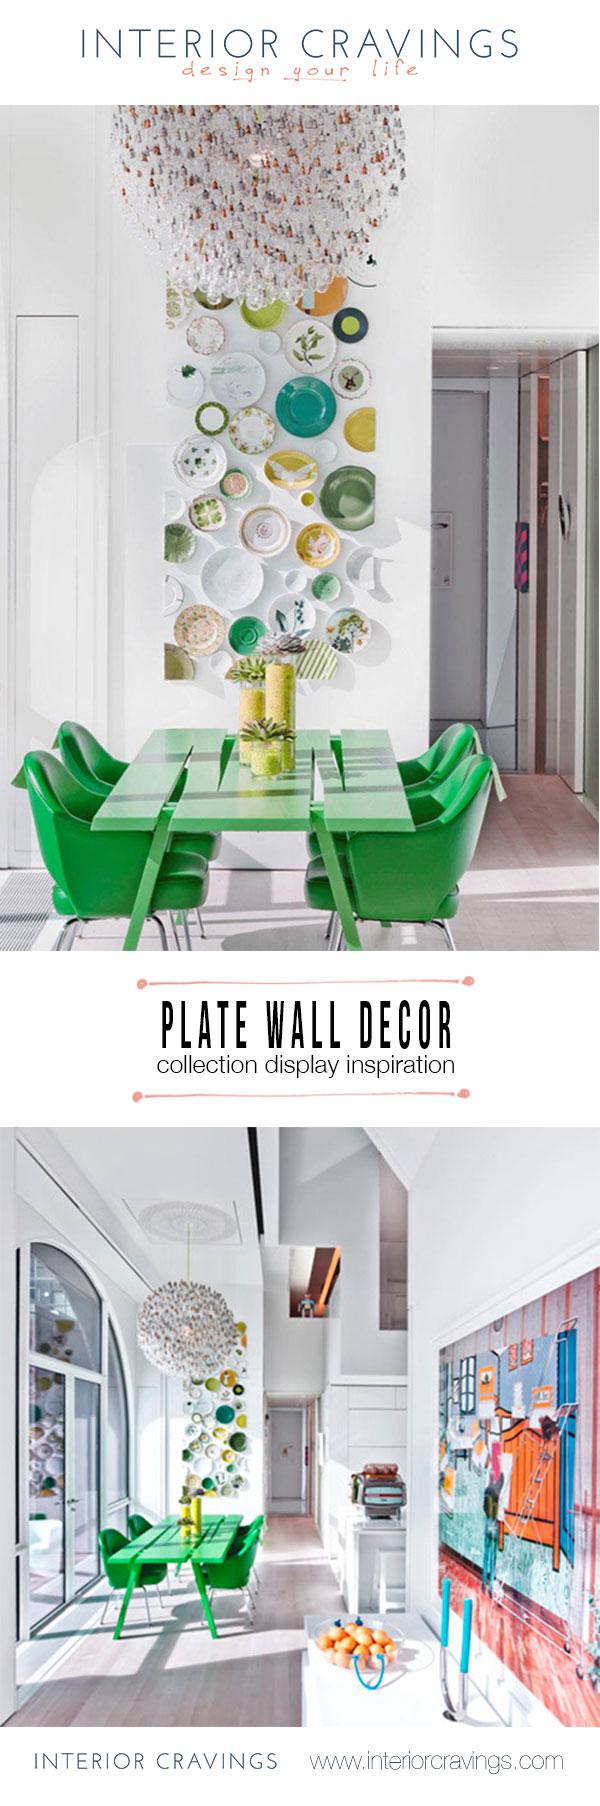 Plate Wall Decor Inspiration Interior Cravings Home Decor Inspiration Interior Design Tools And Diy Design Courses